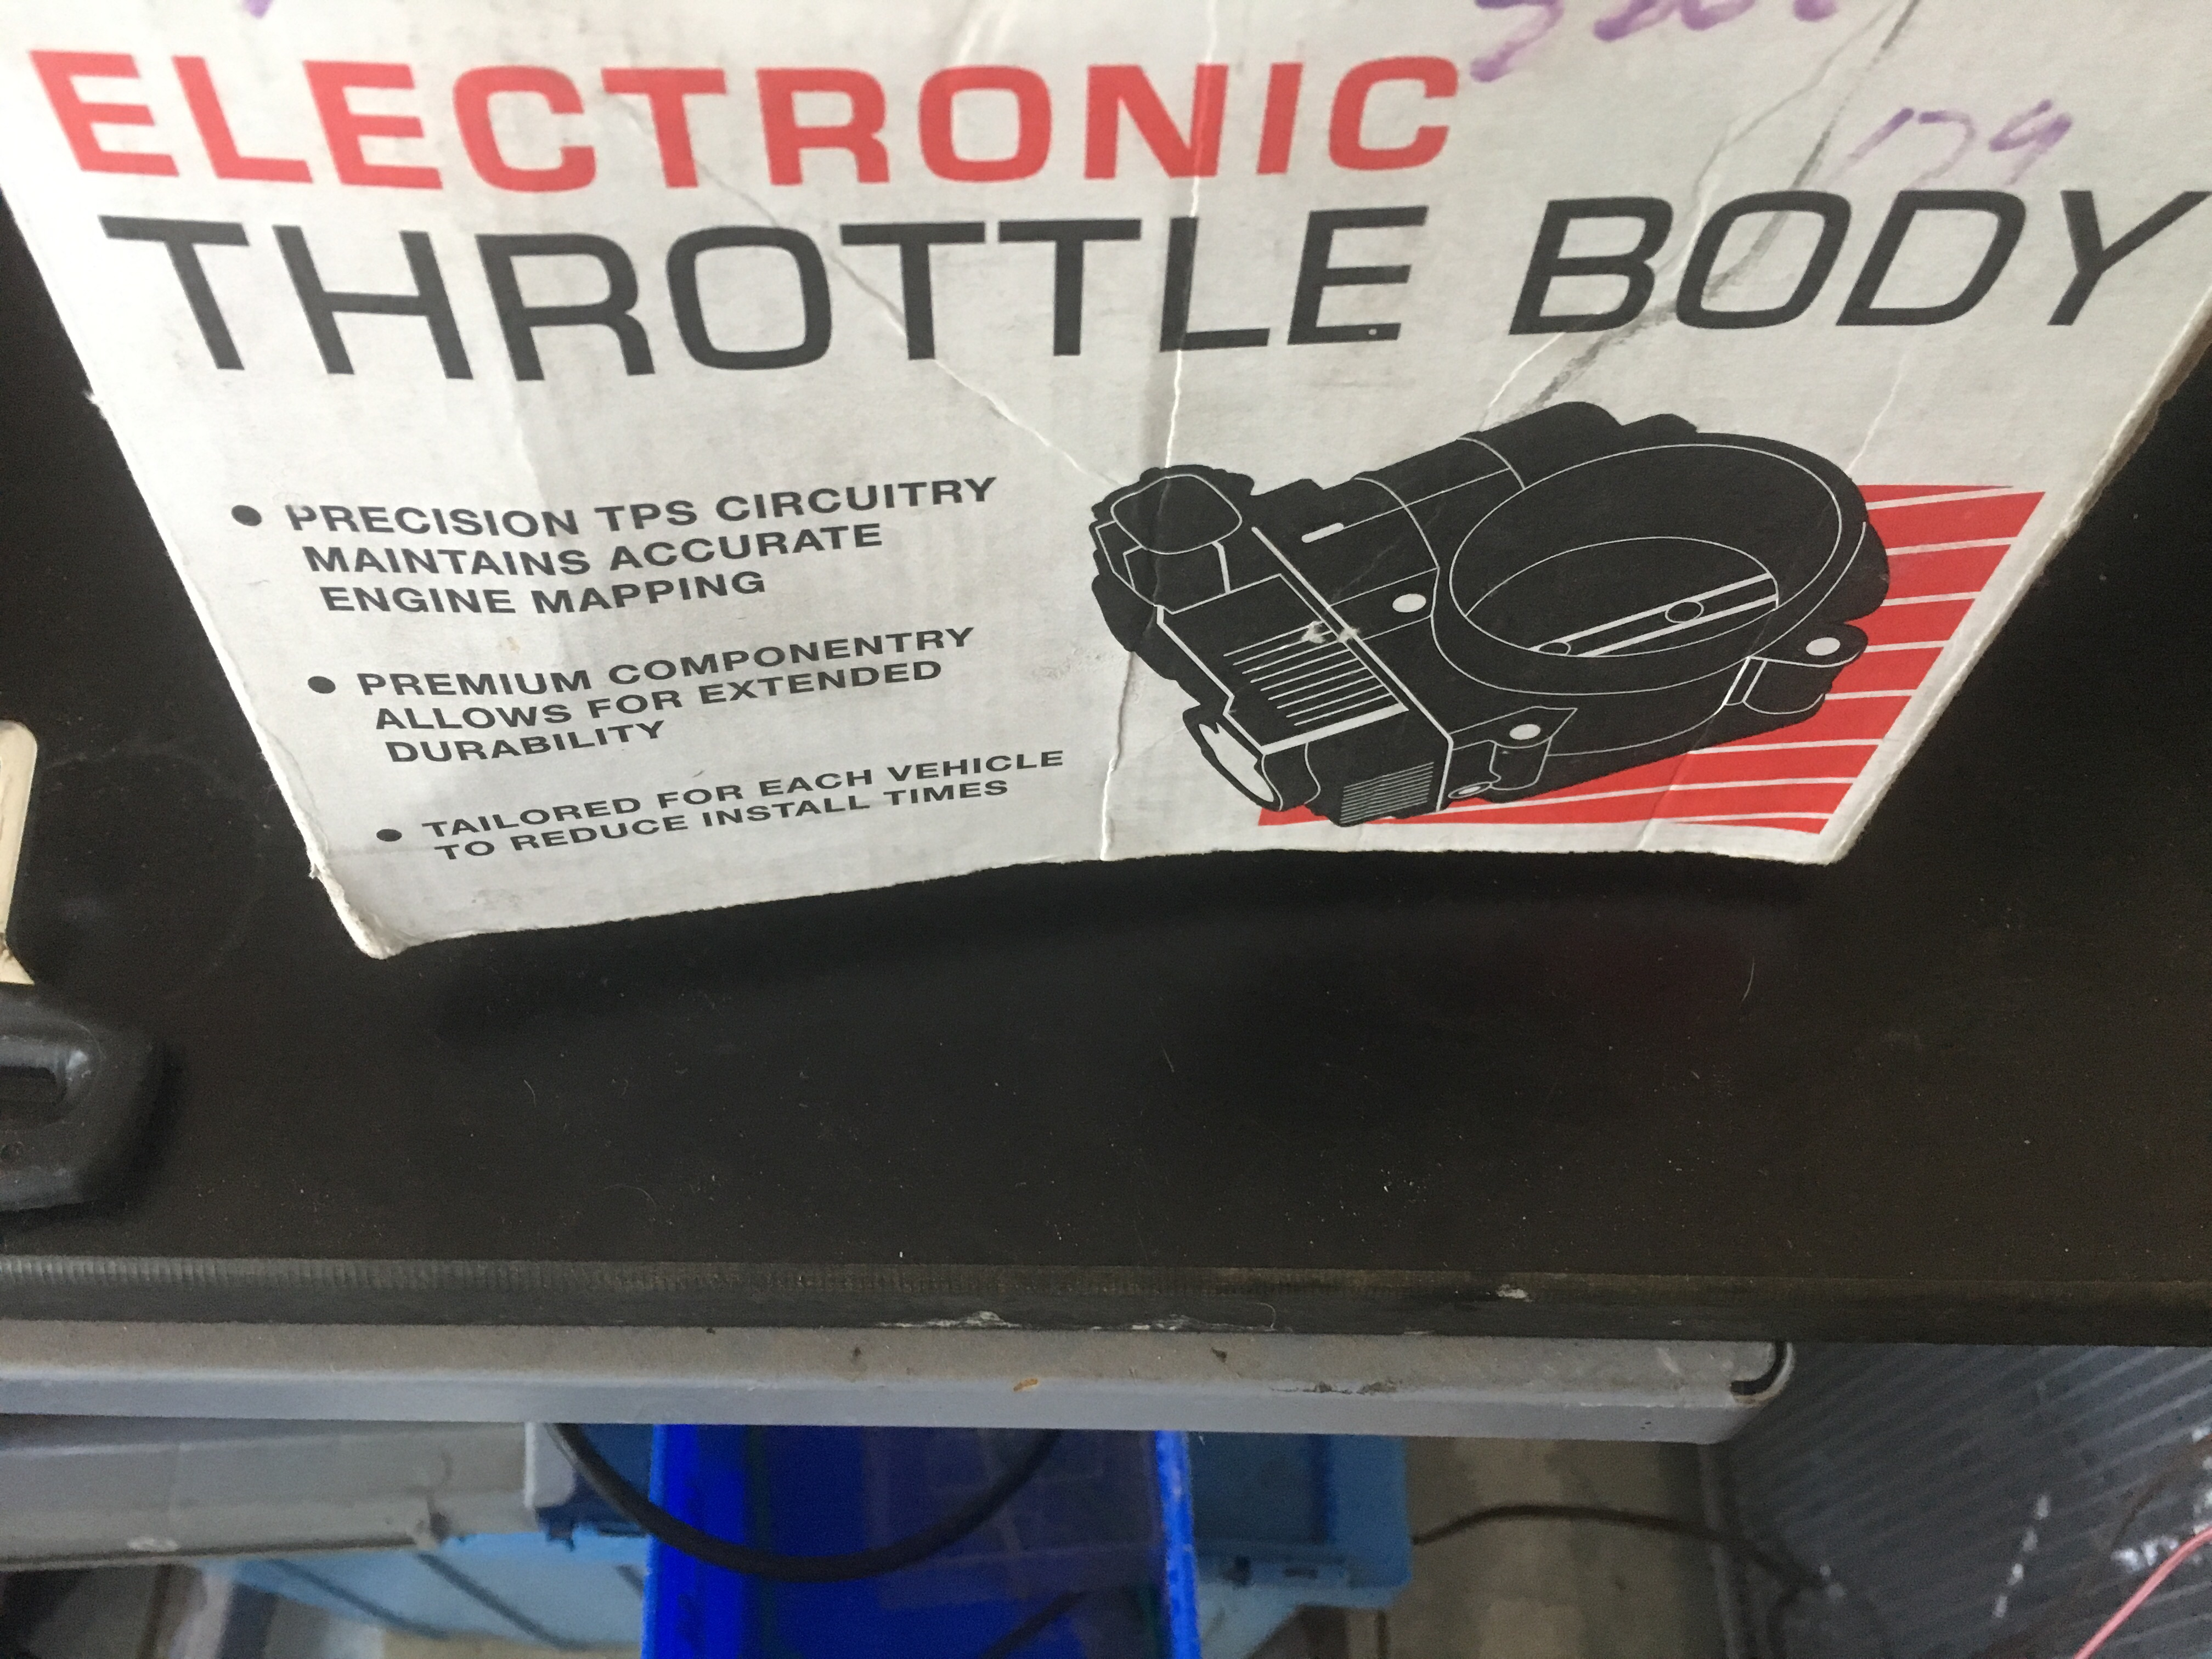 Hitachi ETB0015 Throttle Body